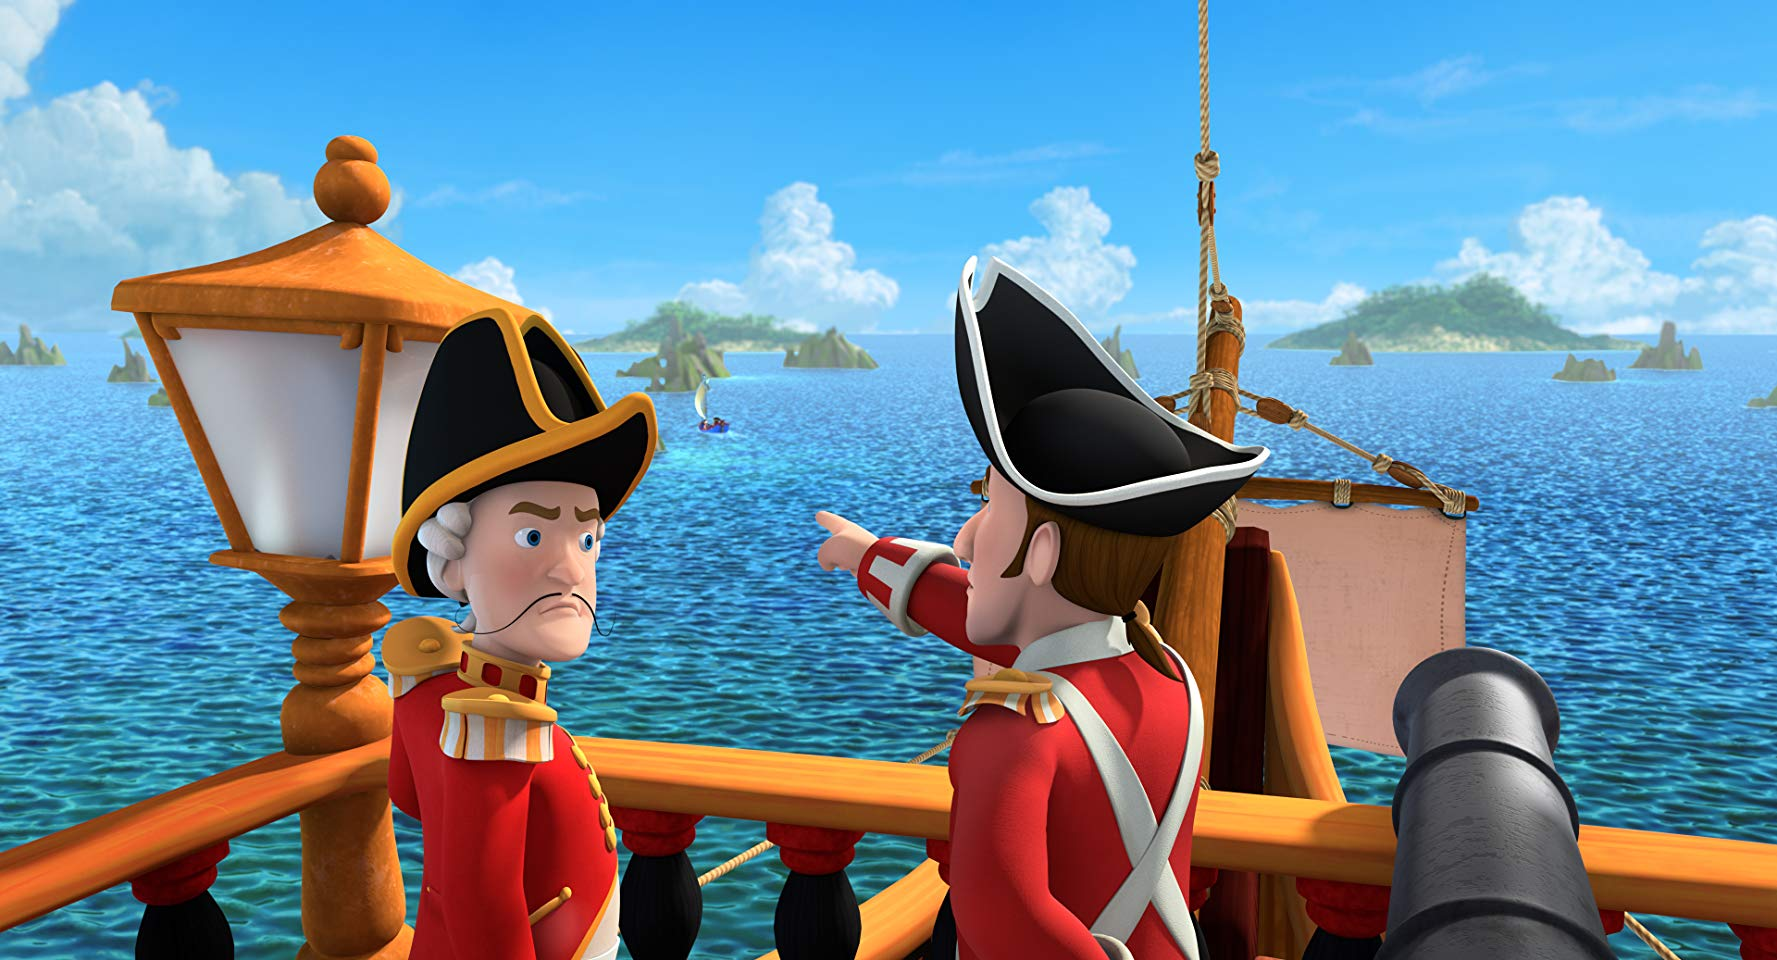 Капитан семи морей, кадр № 1